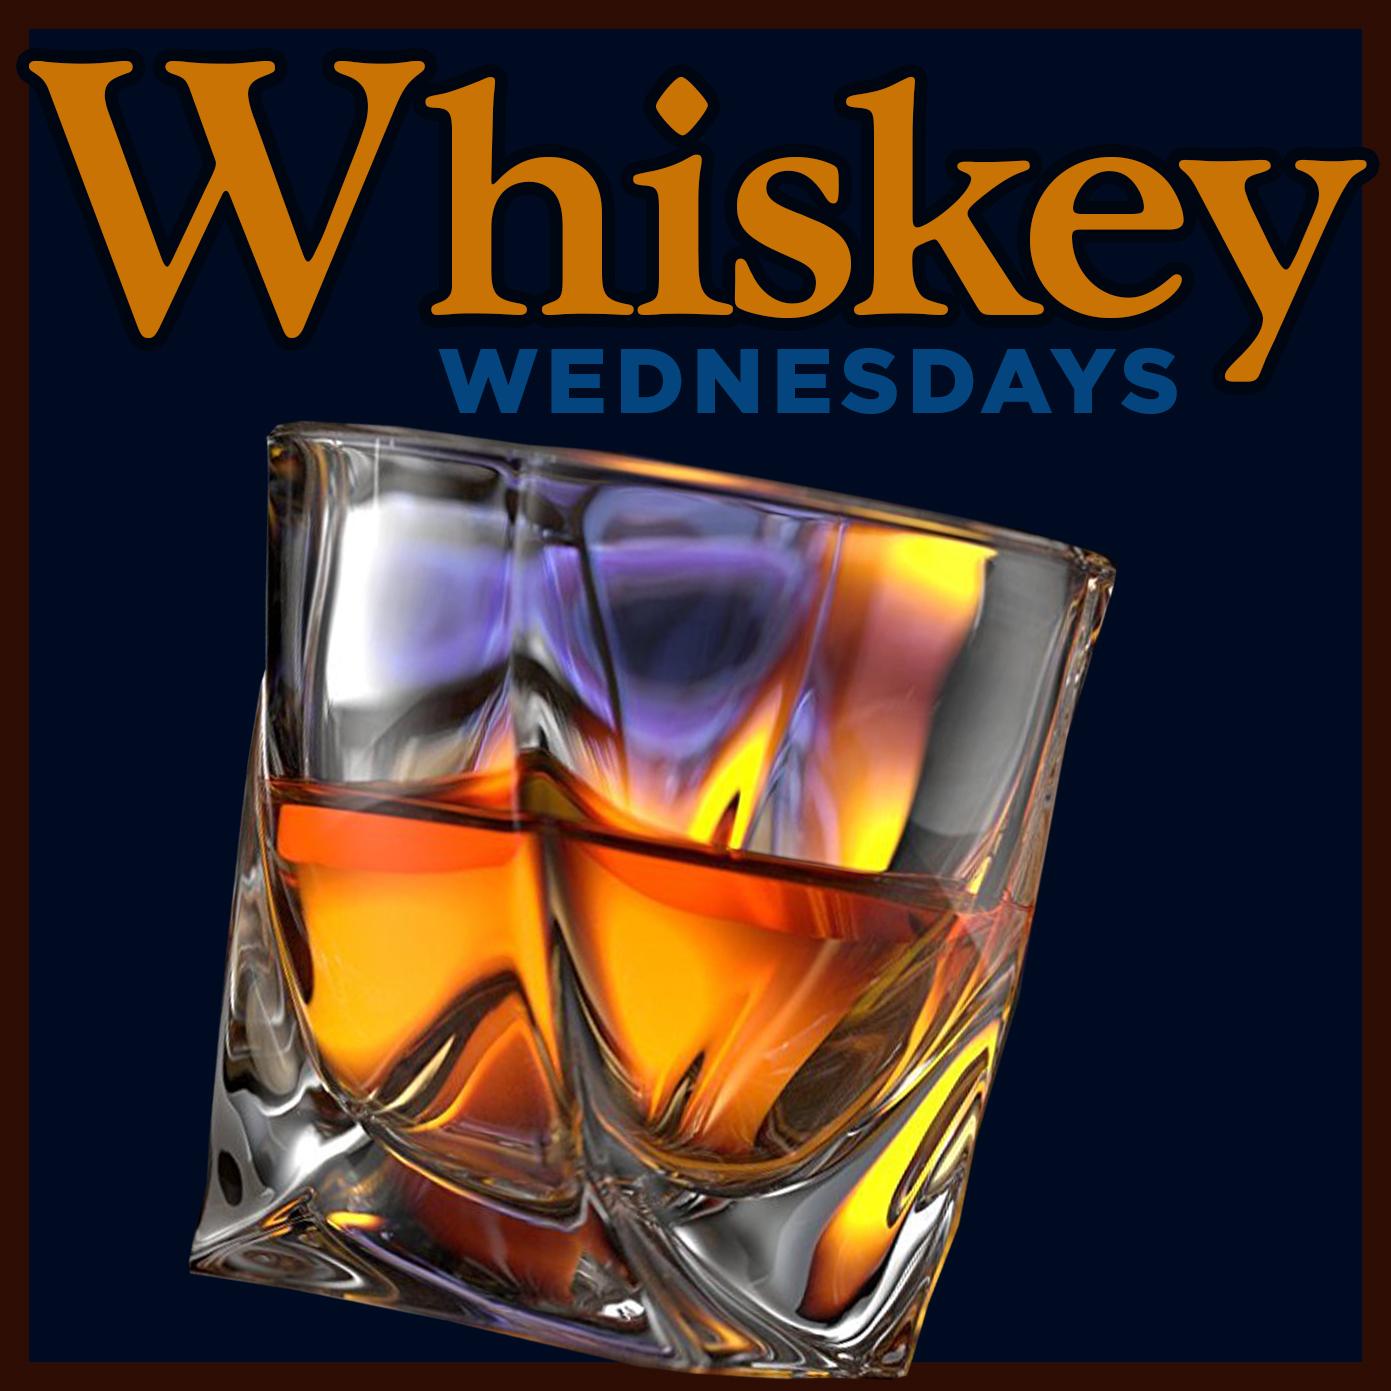 Chandelier Bar  Whiskey Wednesdays